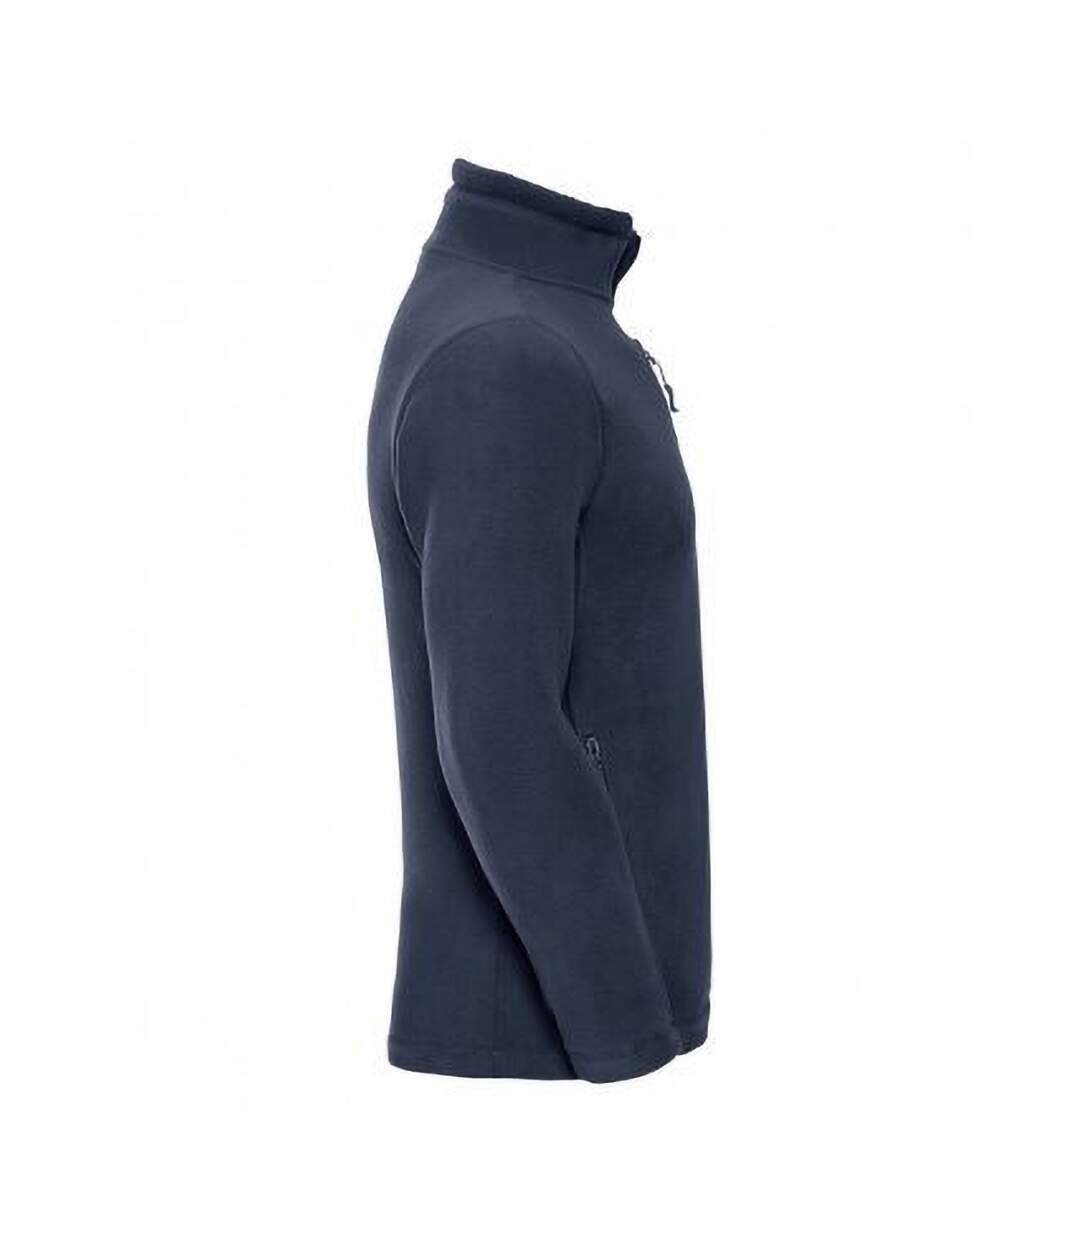 Russell Mens Full Zip Outdoor Fleece Jacket (French Navy) - UTBC575